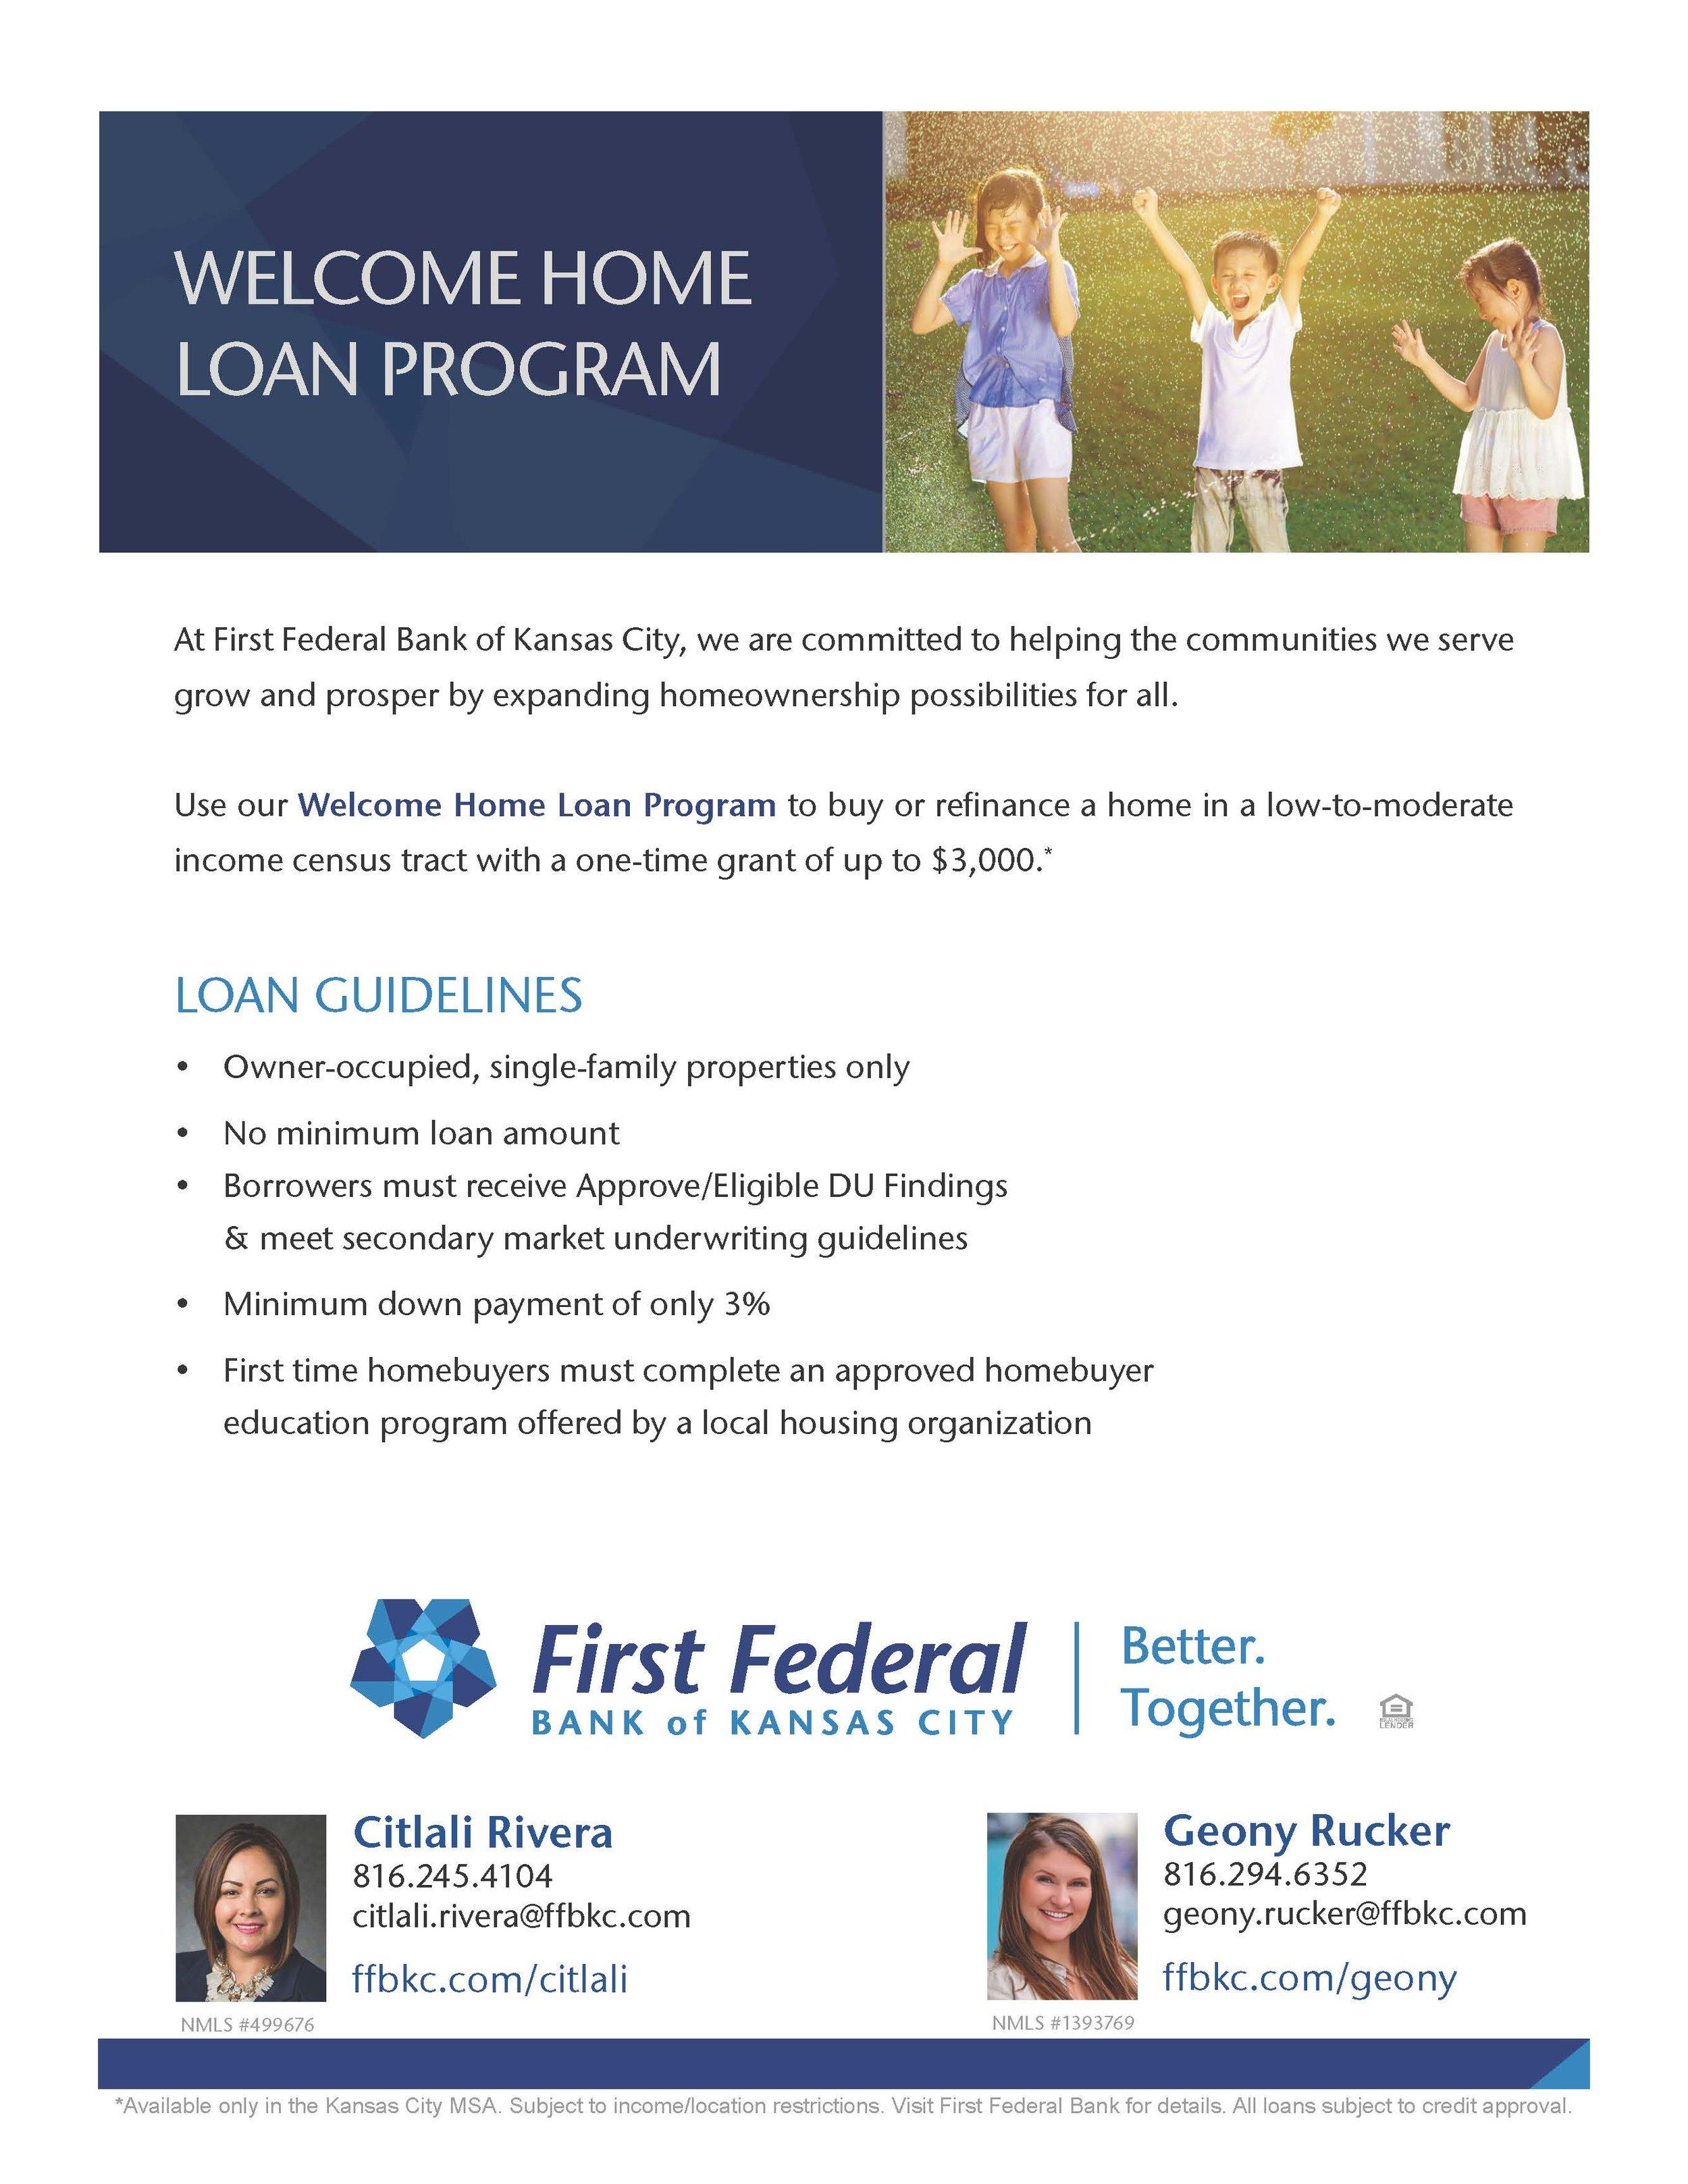 Community Loan Program Rivera and Rucker 2-2019.jpg